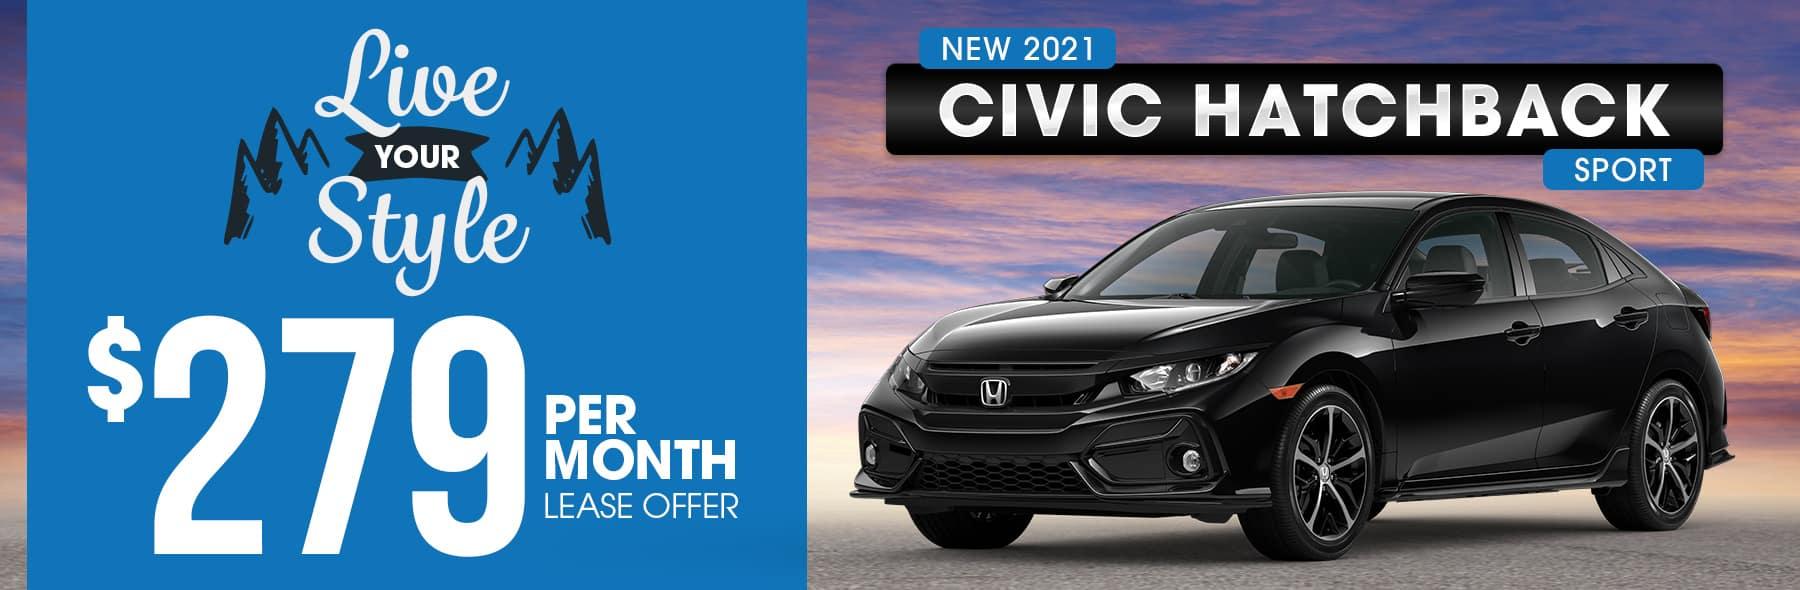 IGH-May21-HP-Civic-Hatch-v1